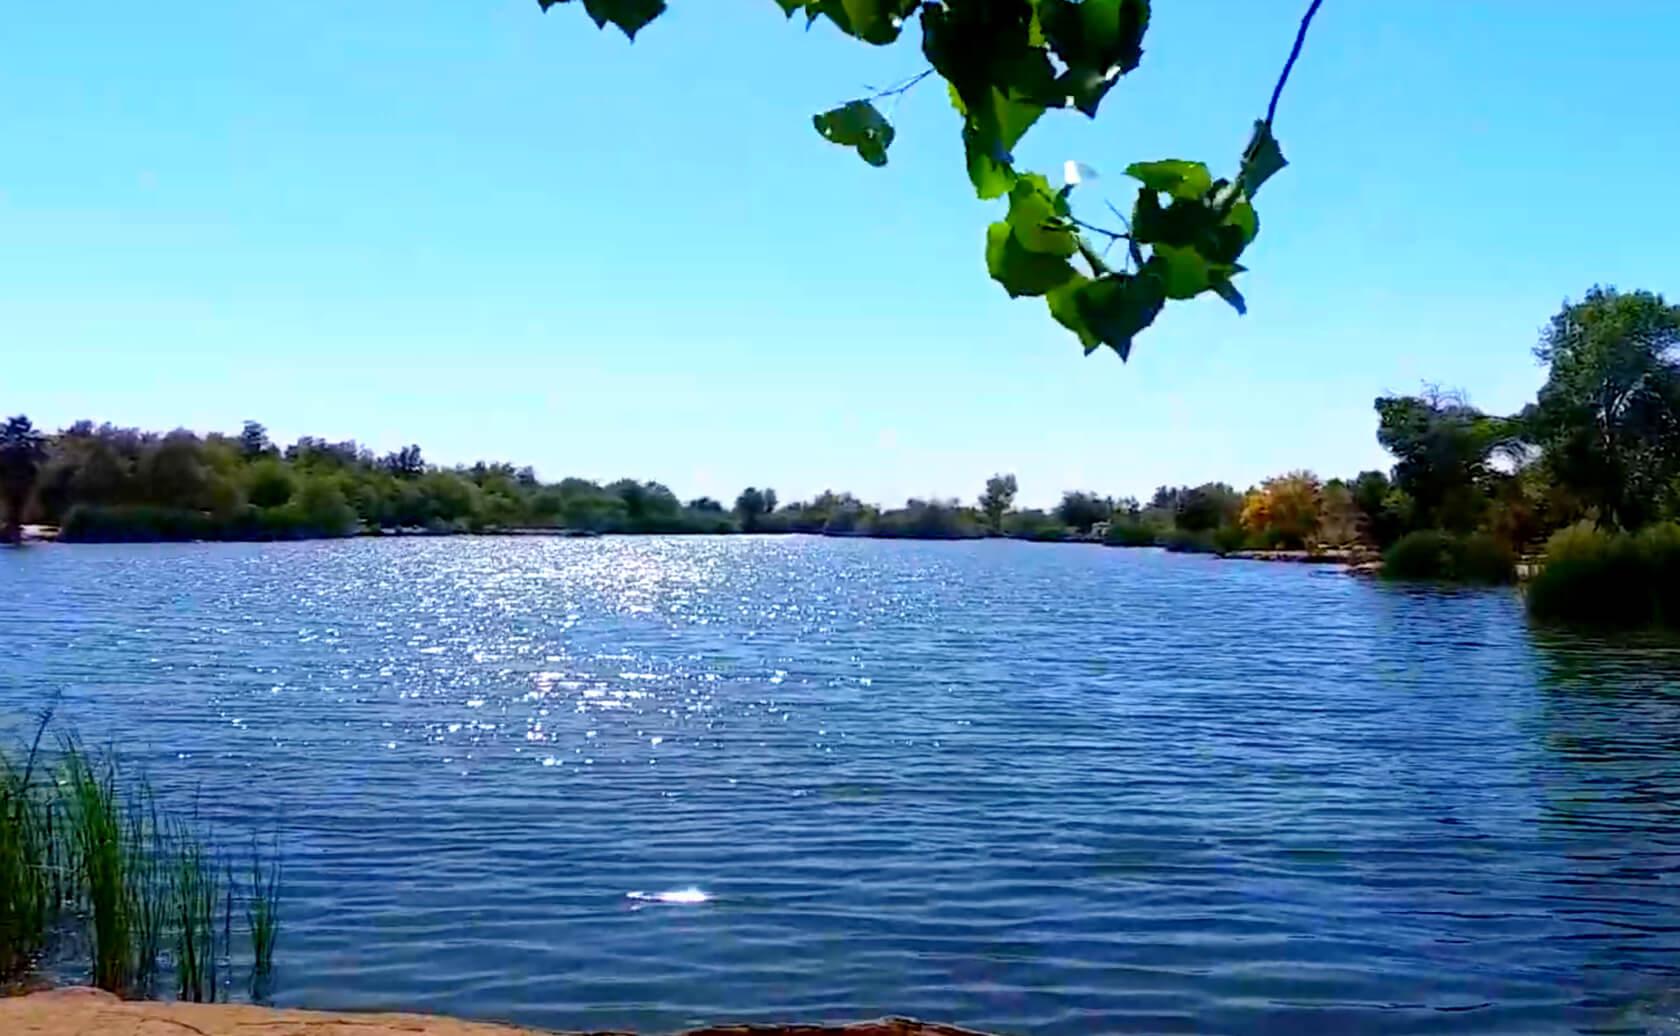 Fortuna-Lake-Fishing-Guide-Report-Yuma-AZ-06